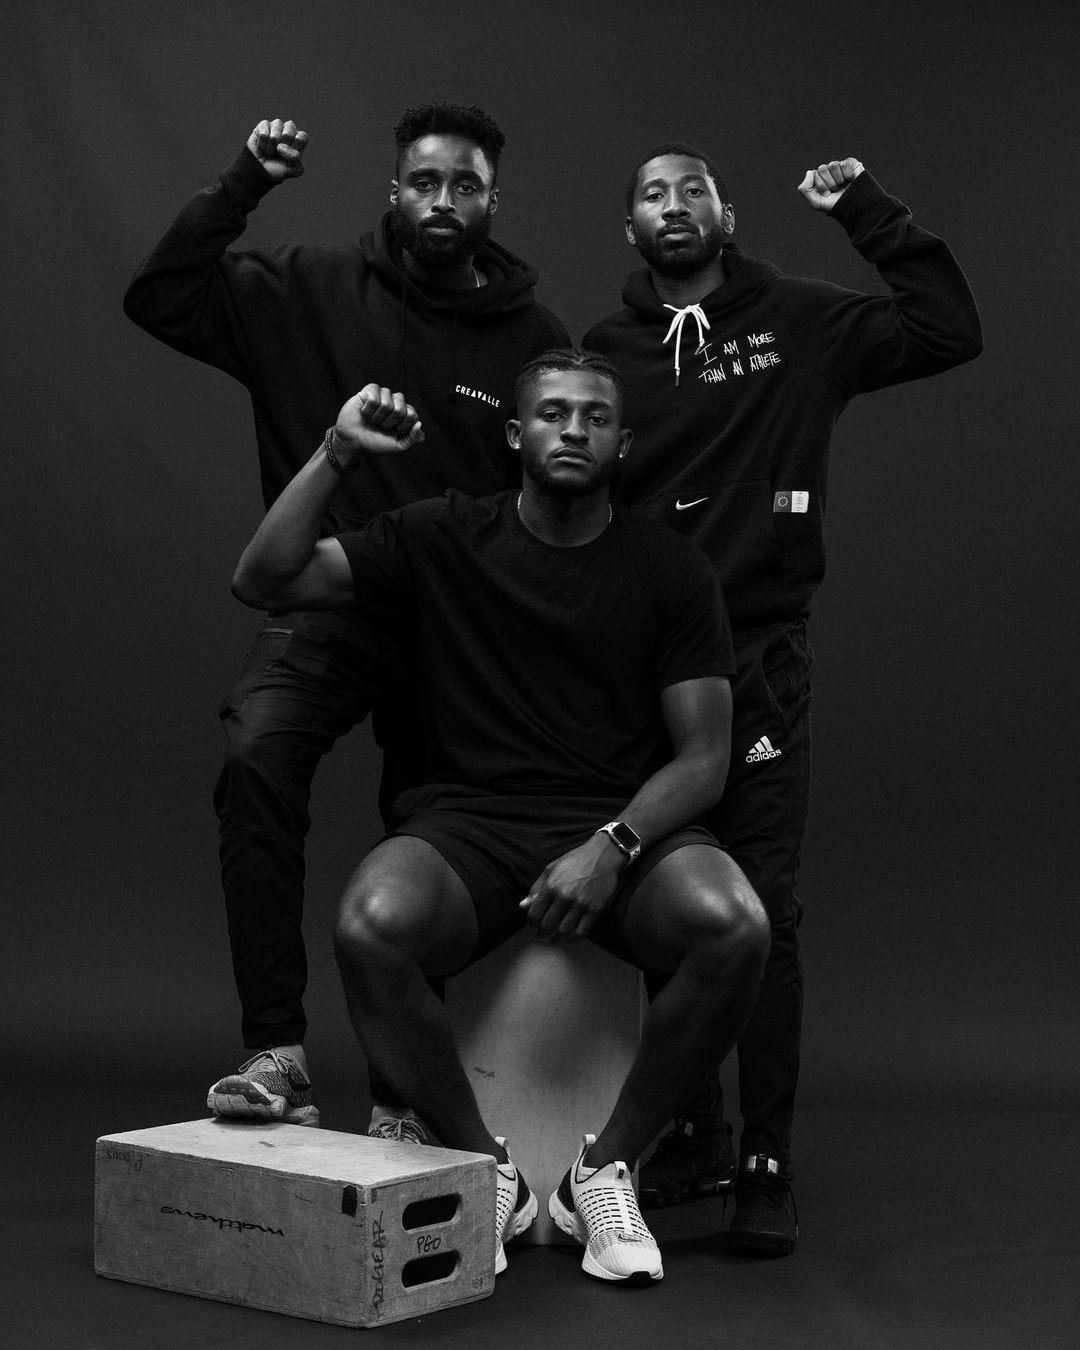 warren creavalle black players for change